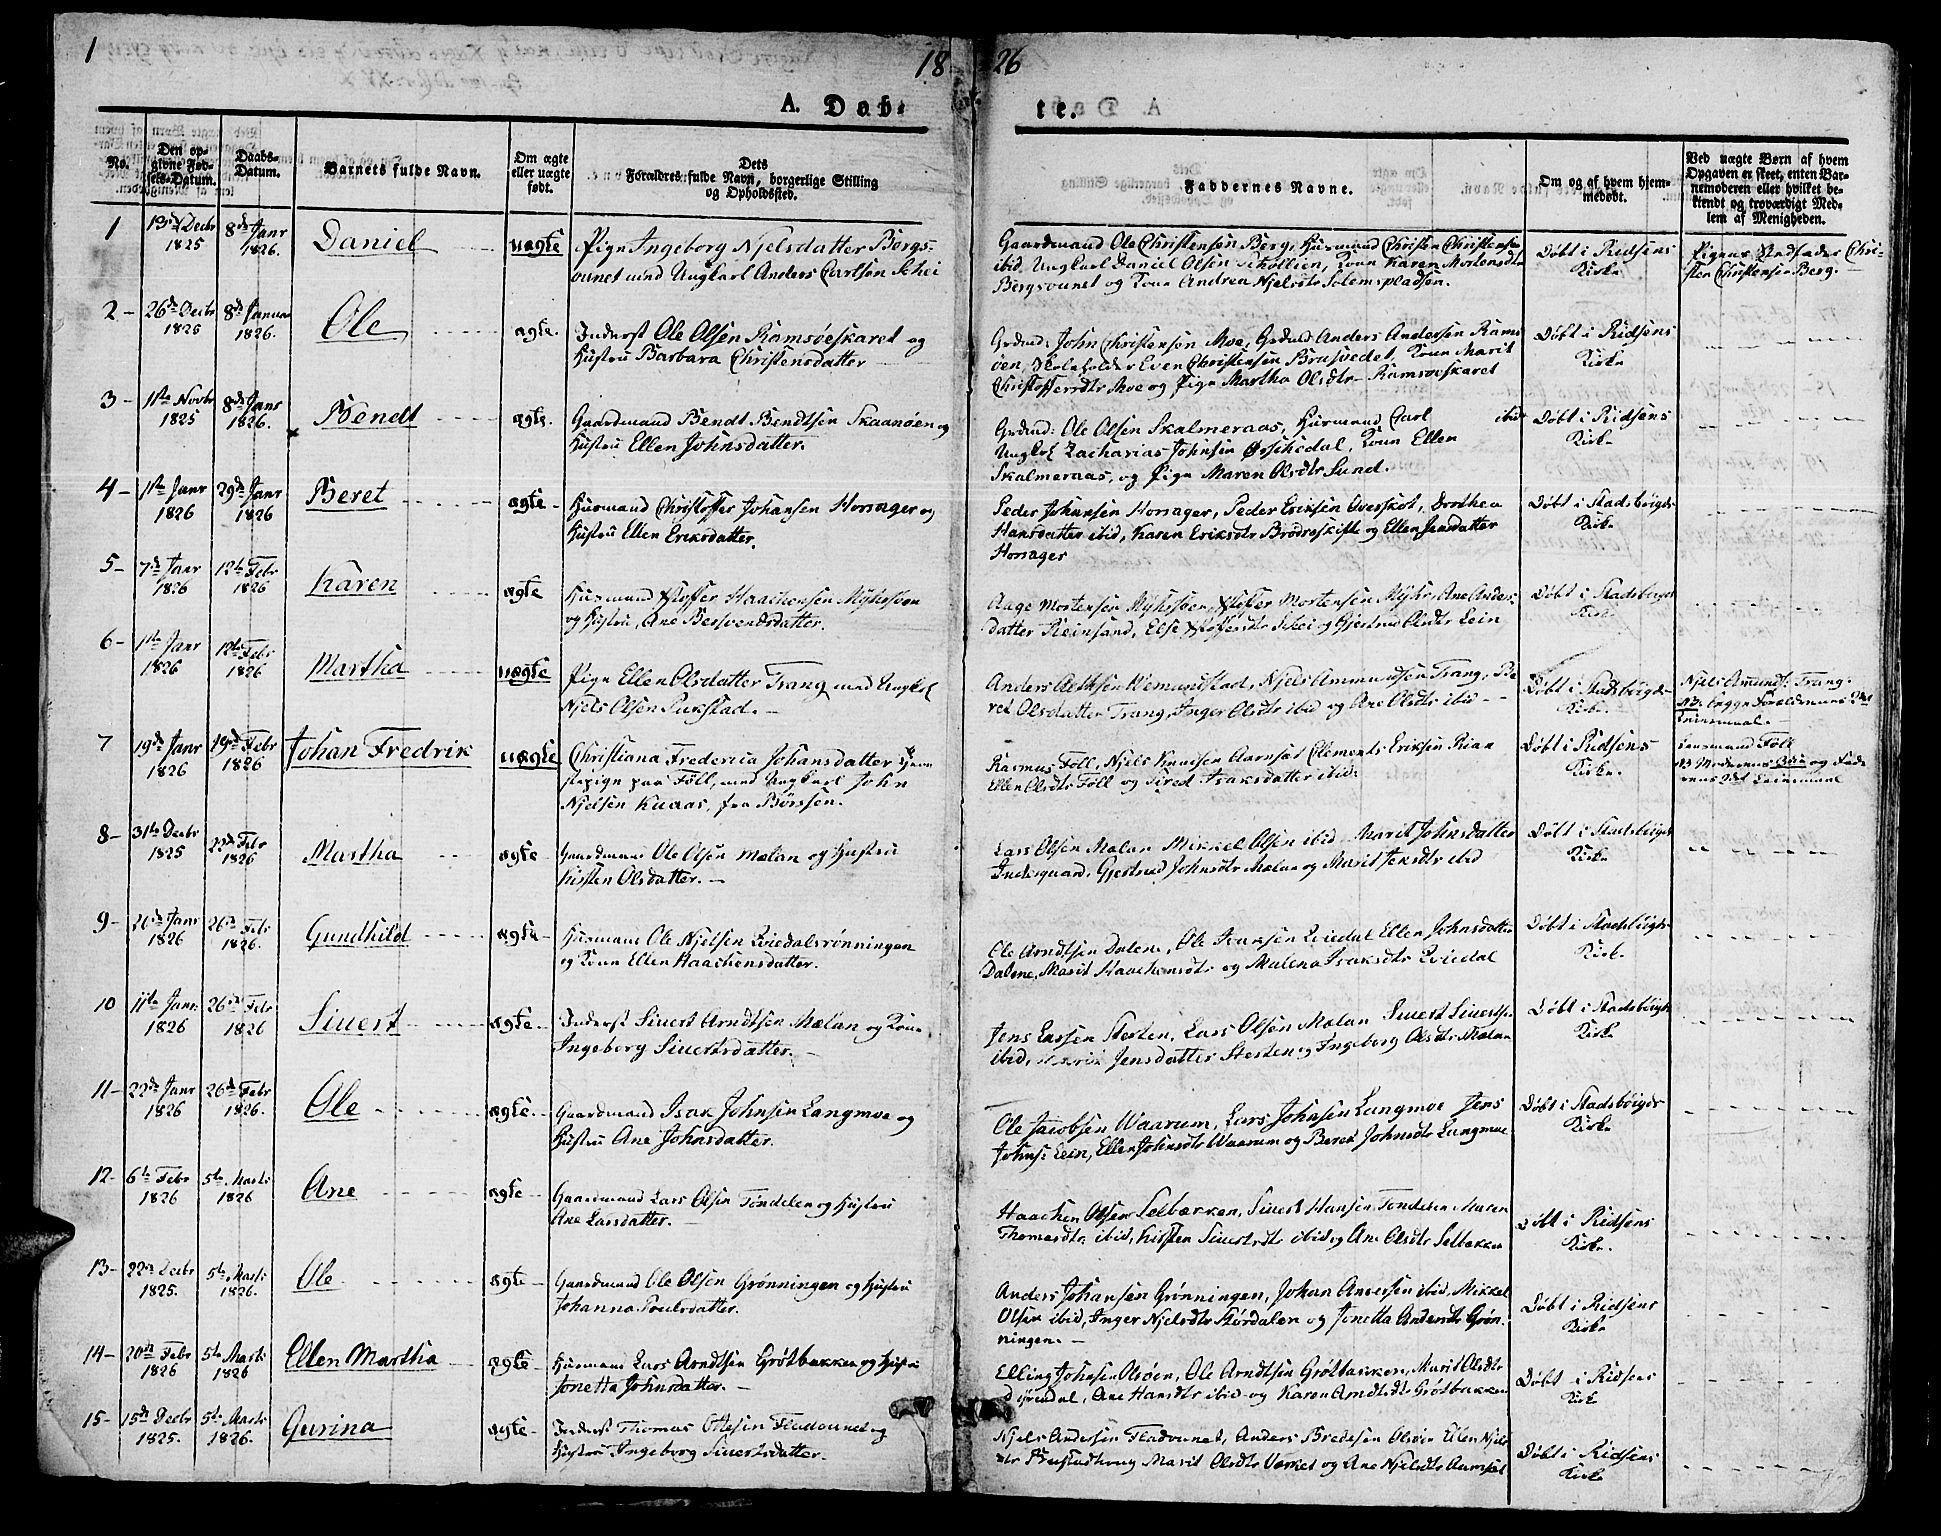 SAT, Ministerialprotokoller, klokkerbøker og fødselsregistre - Sør-Trøndelag, 646/L0609: Parish register (official) no. 646A07, 1826-1838, p. 1